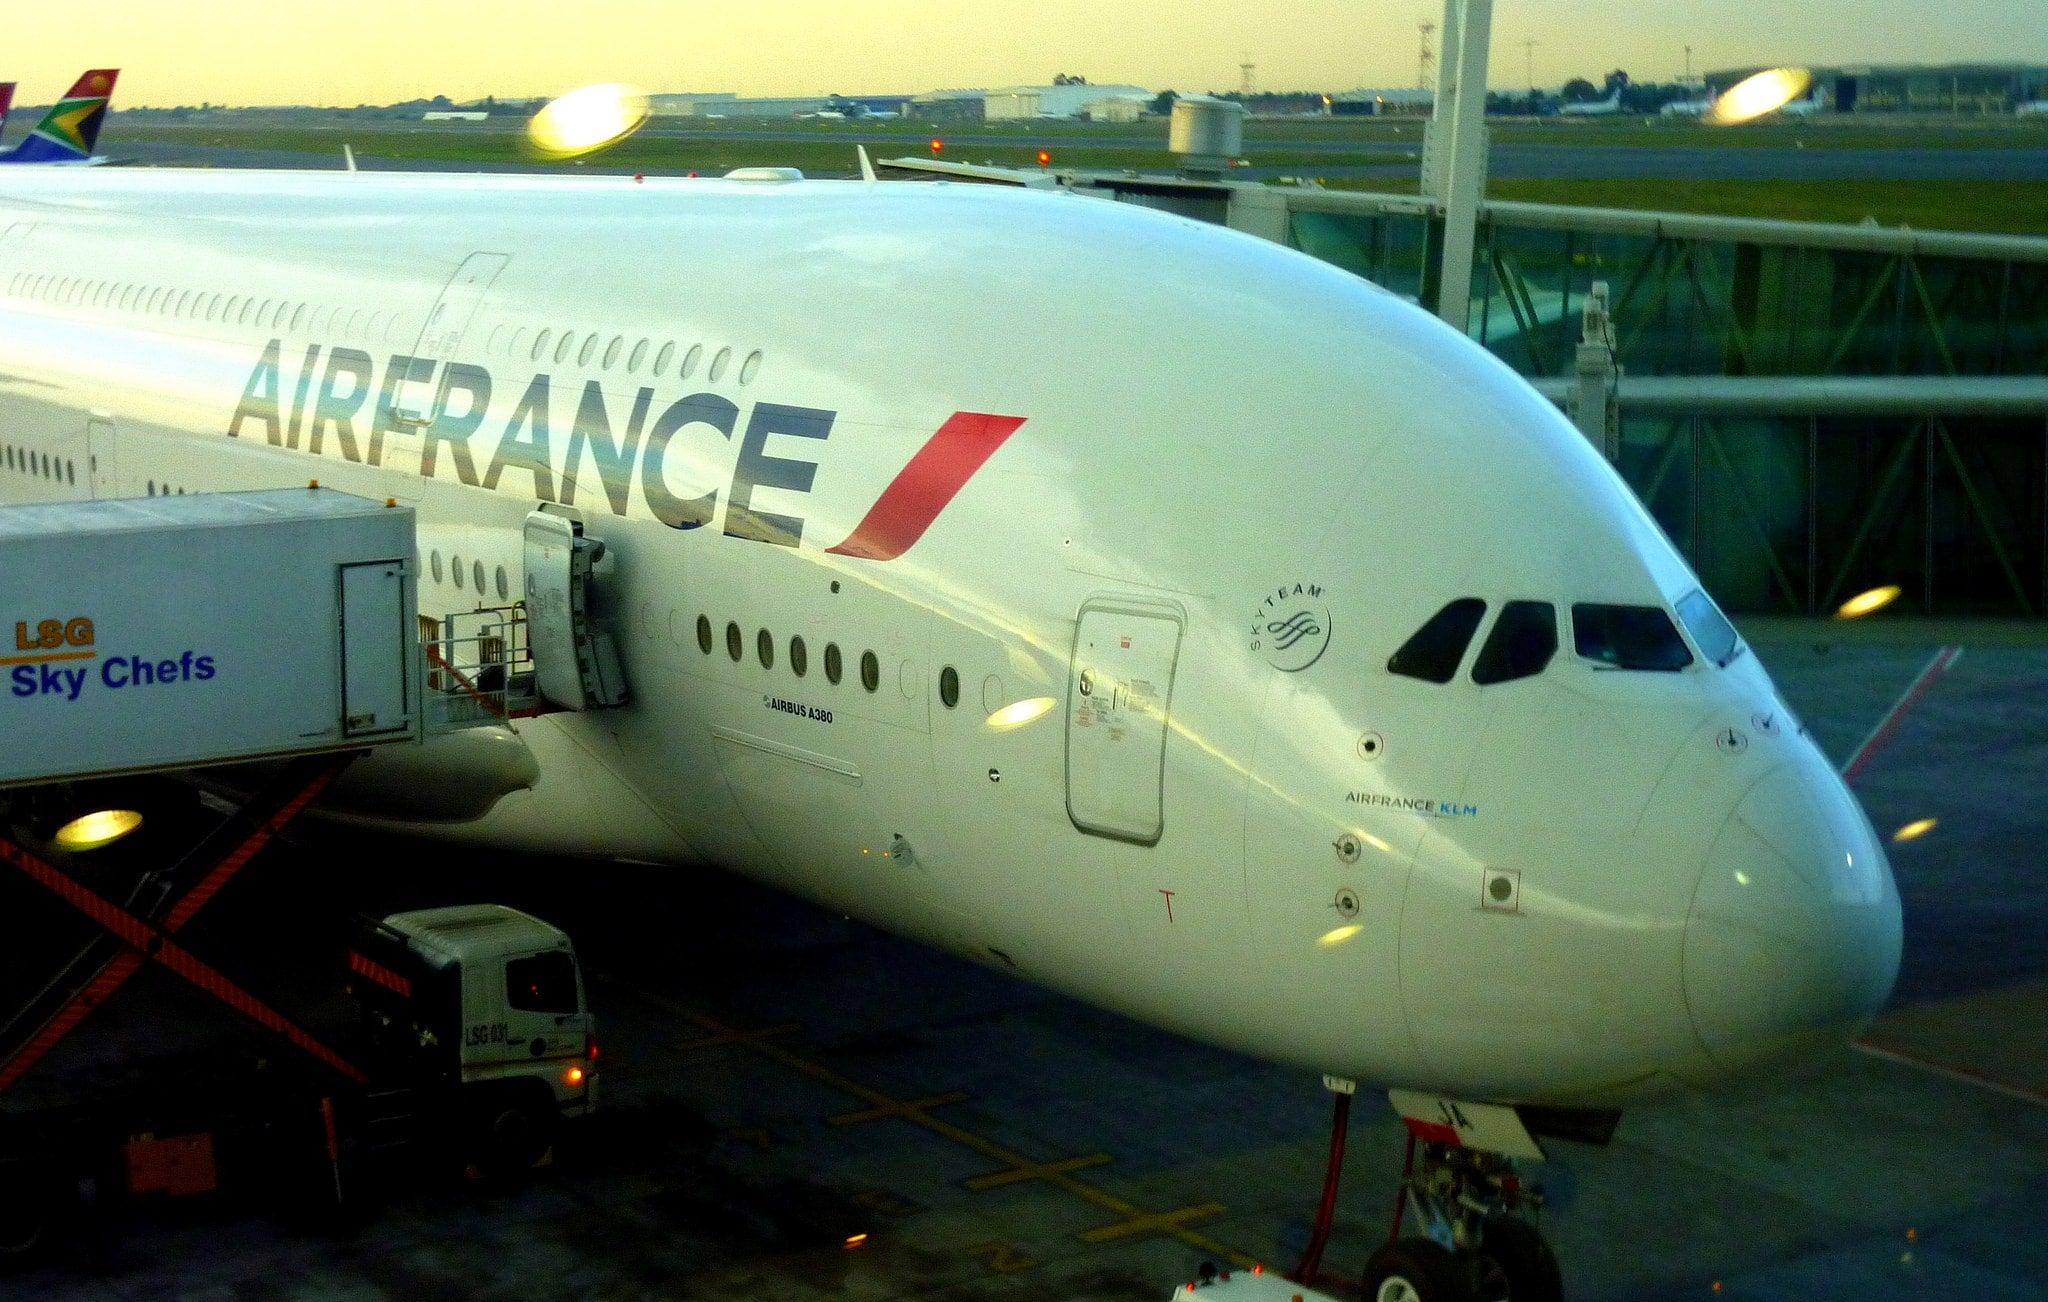 aereo air france check in online edreams blog di viaggi